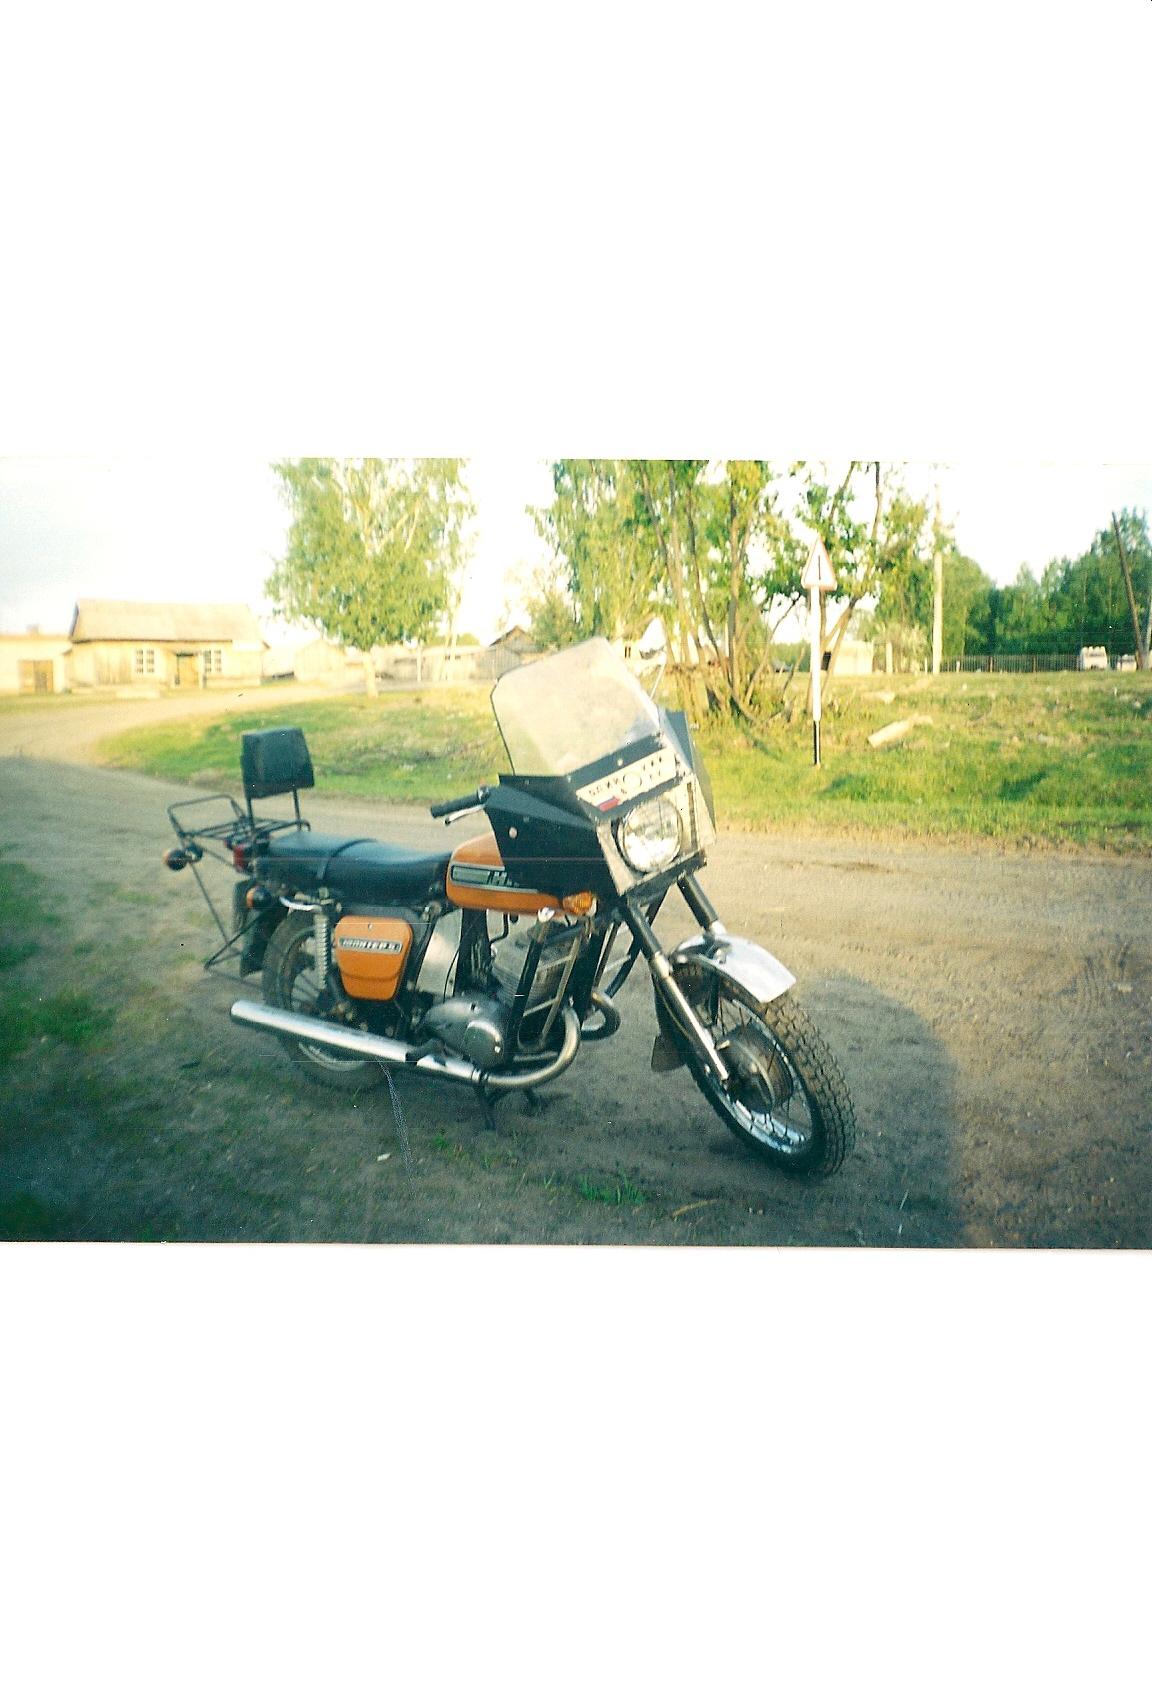 Мотоцикл иж юпитер первое фото